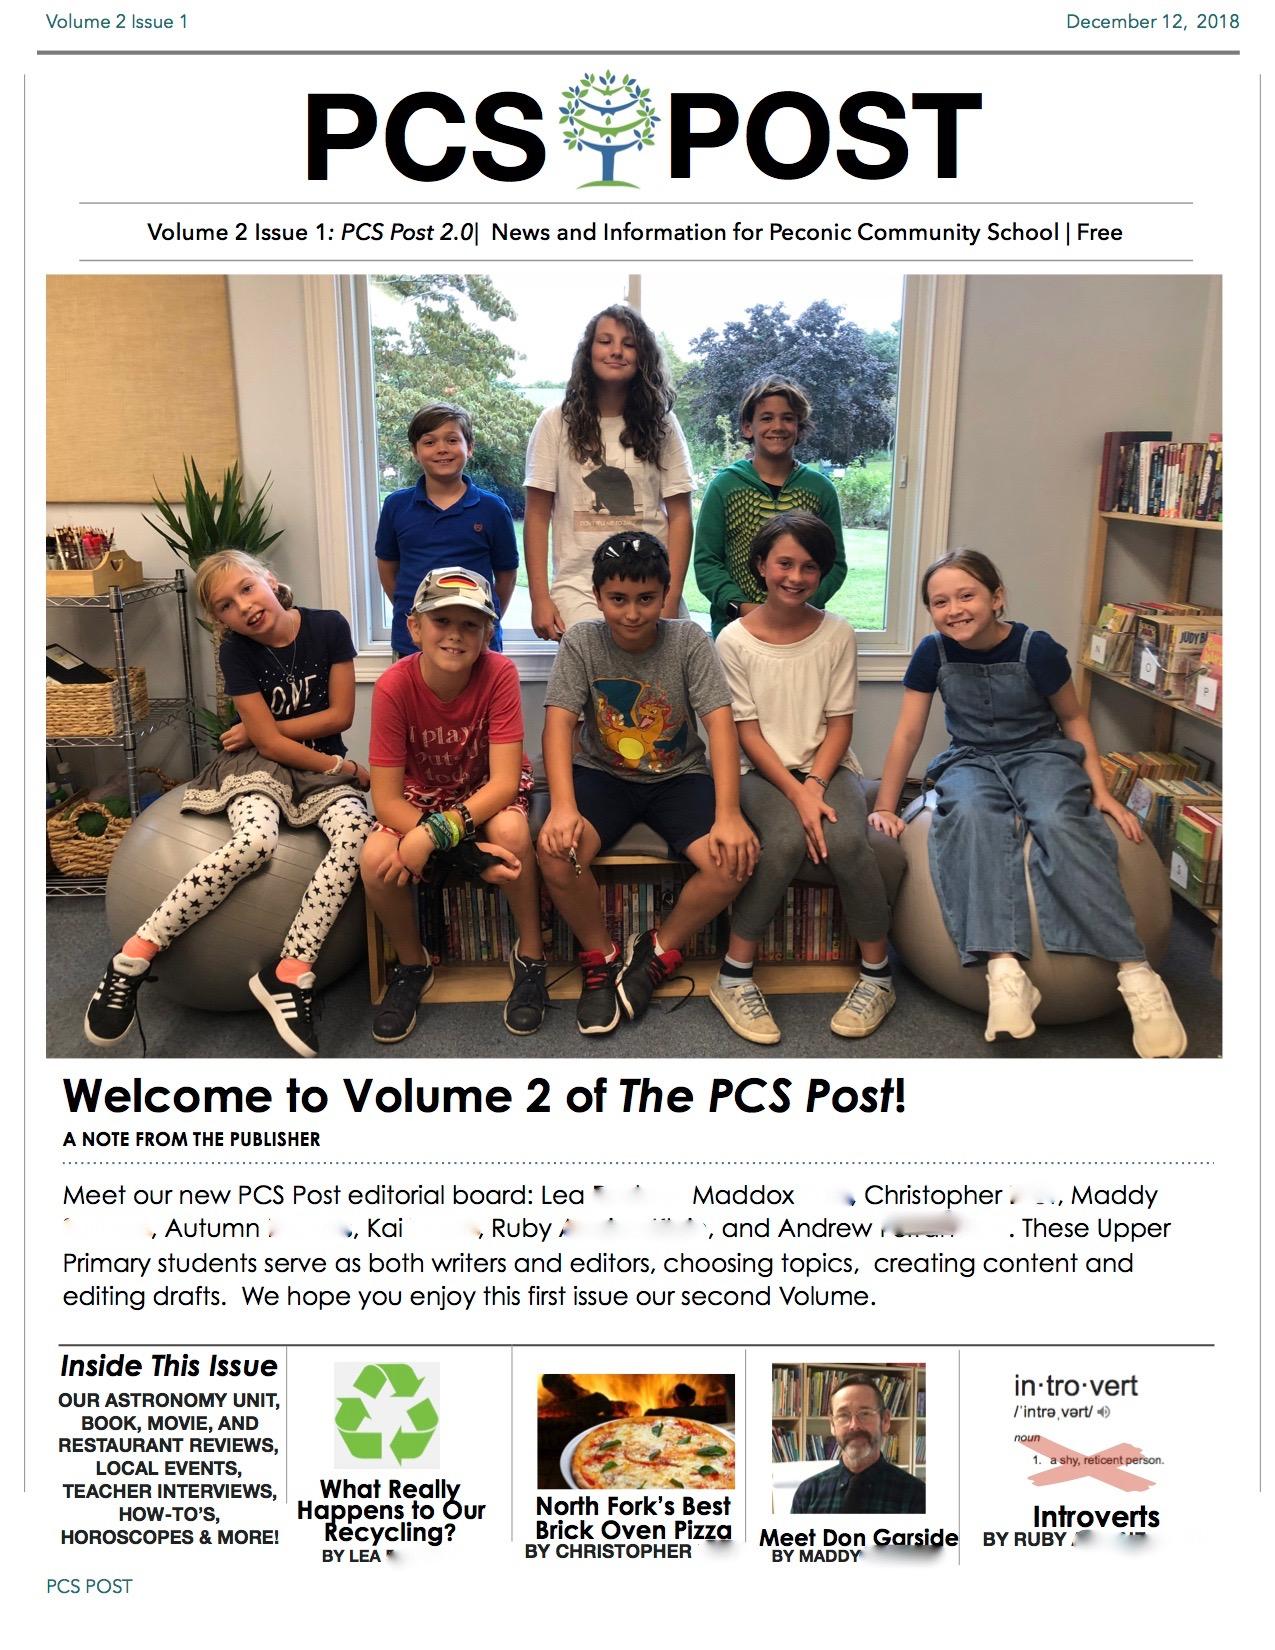 PCS POST vol 2 issue 1 pg 1 JPEG (1).jpg